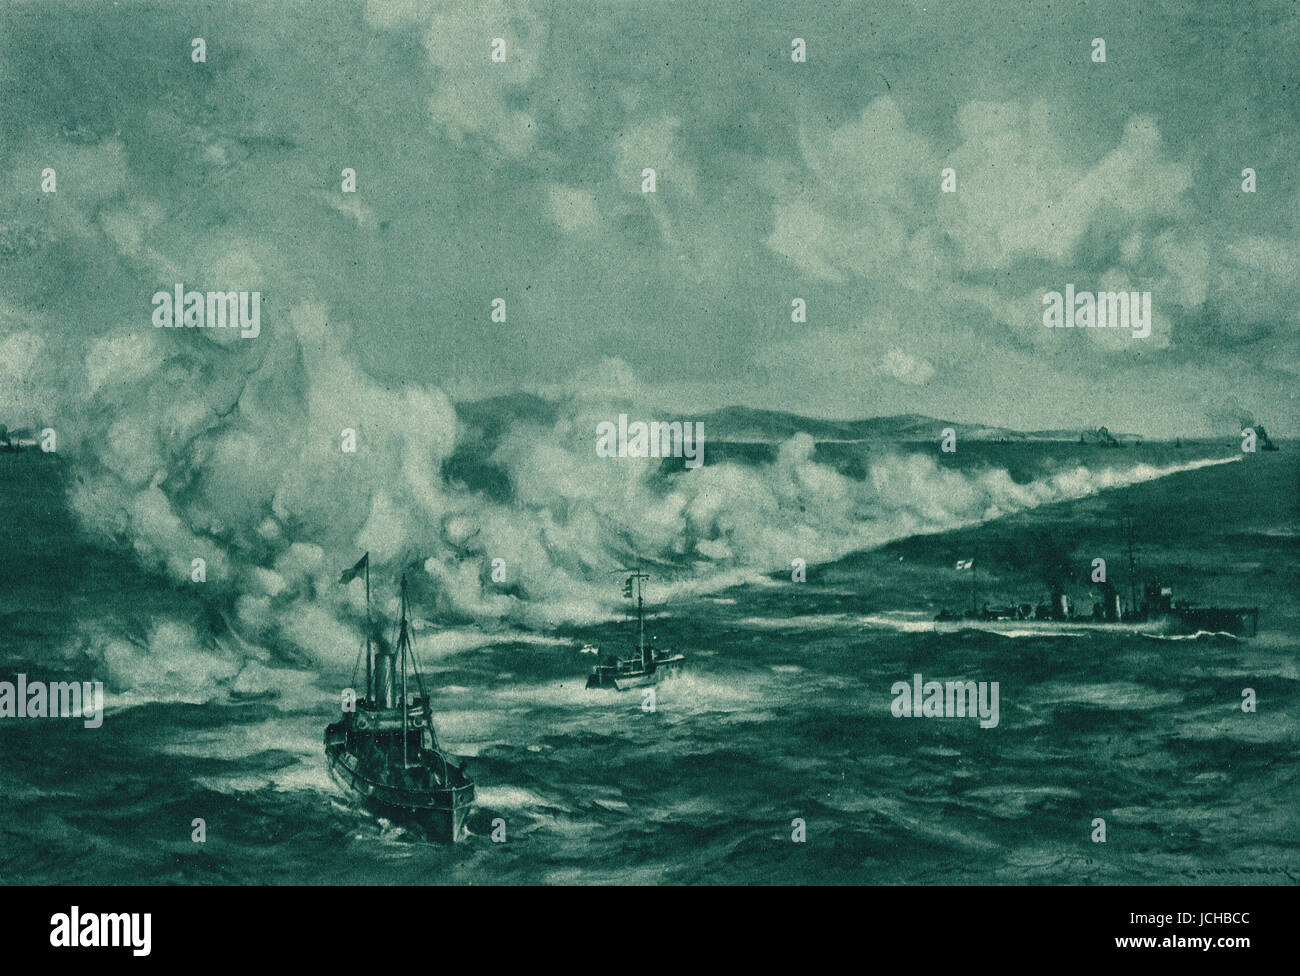 Naval White Smoke screen First World War - Stock Image